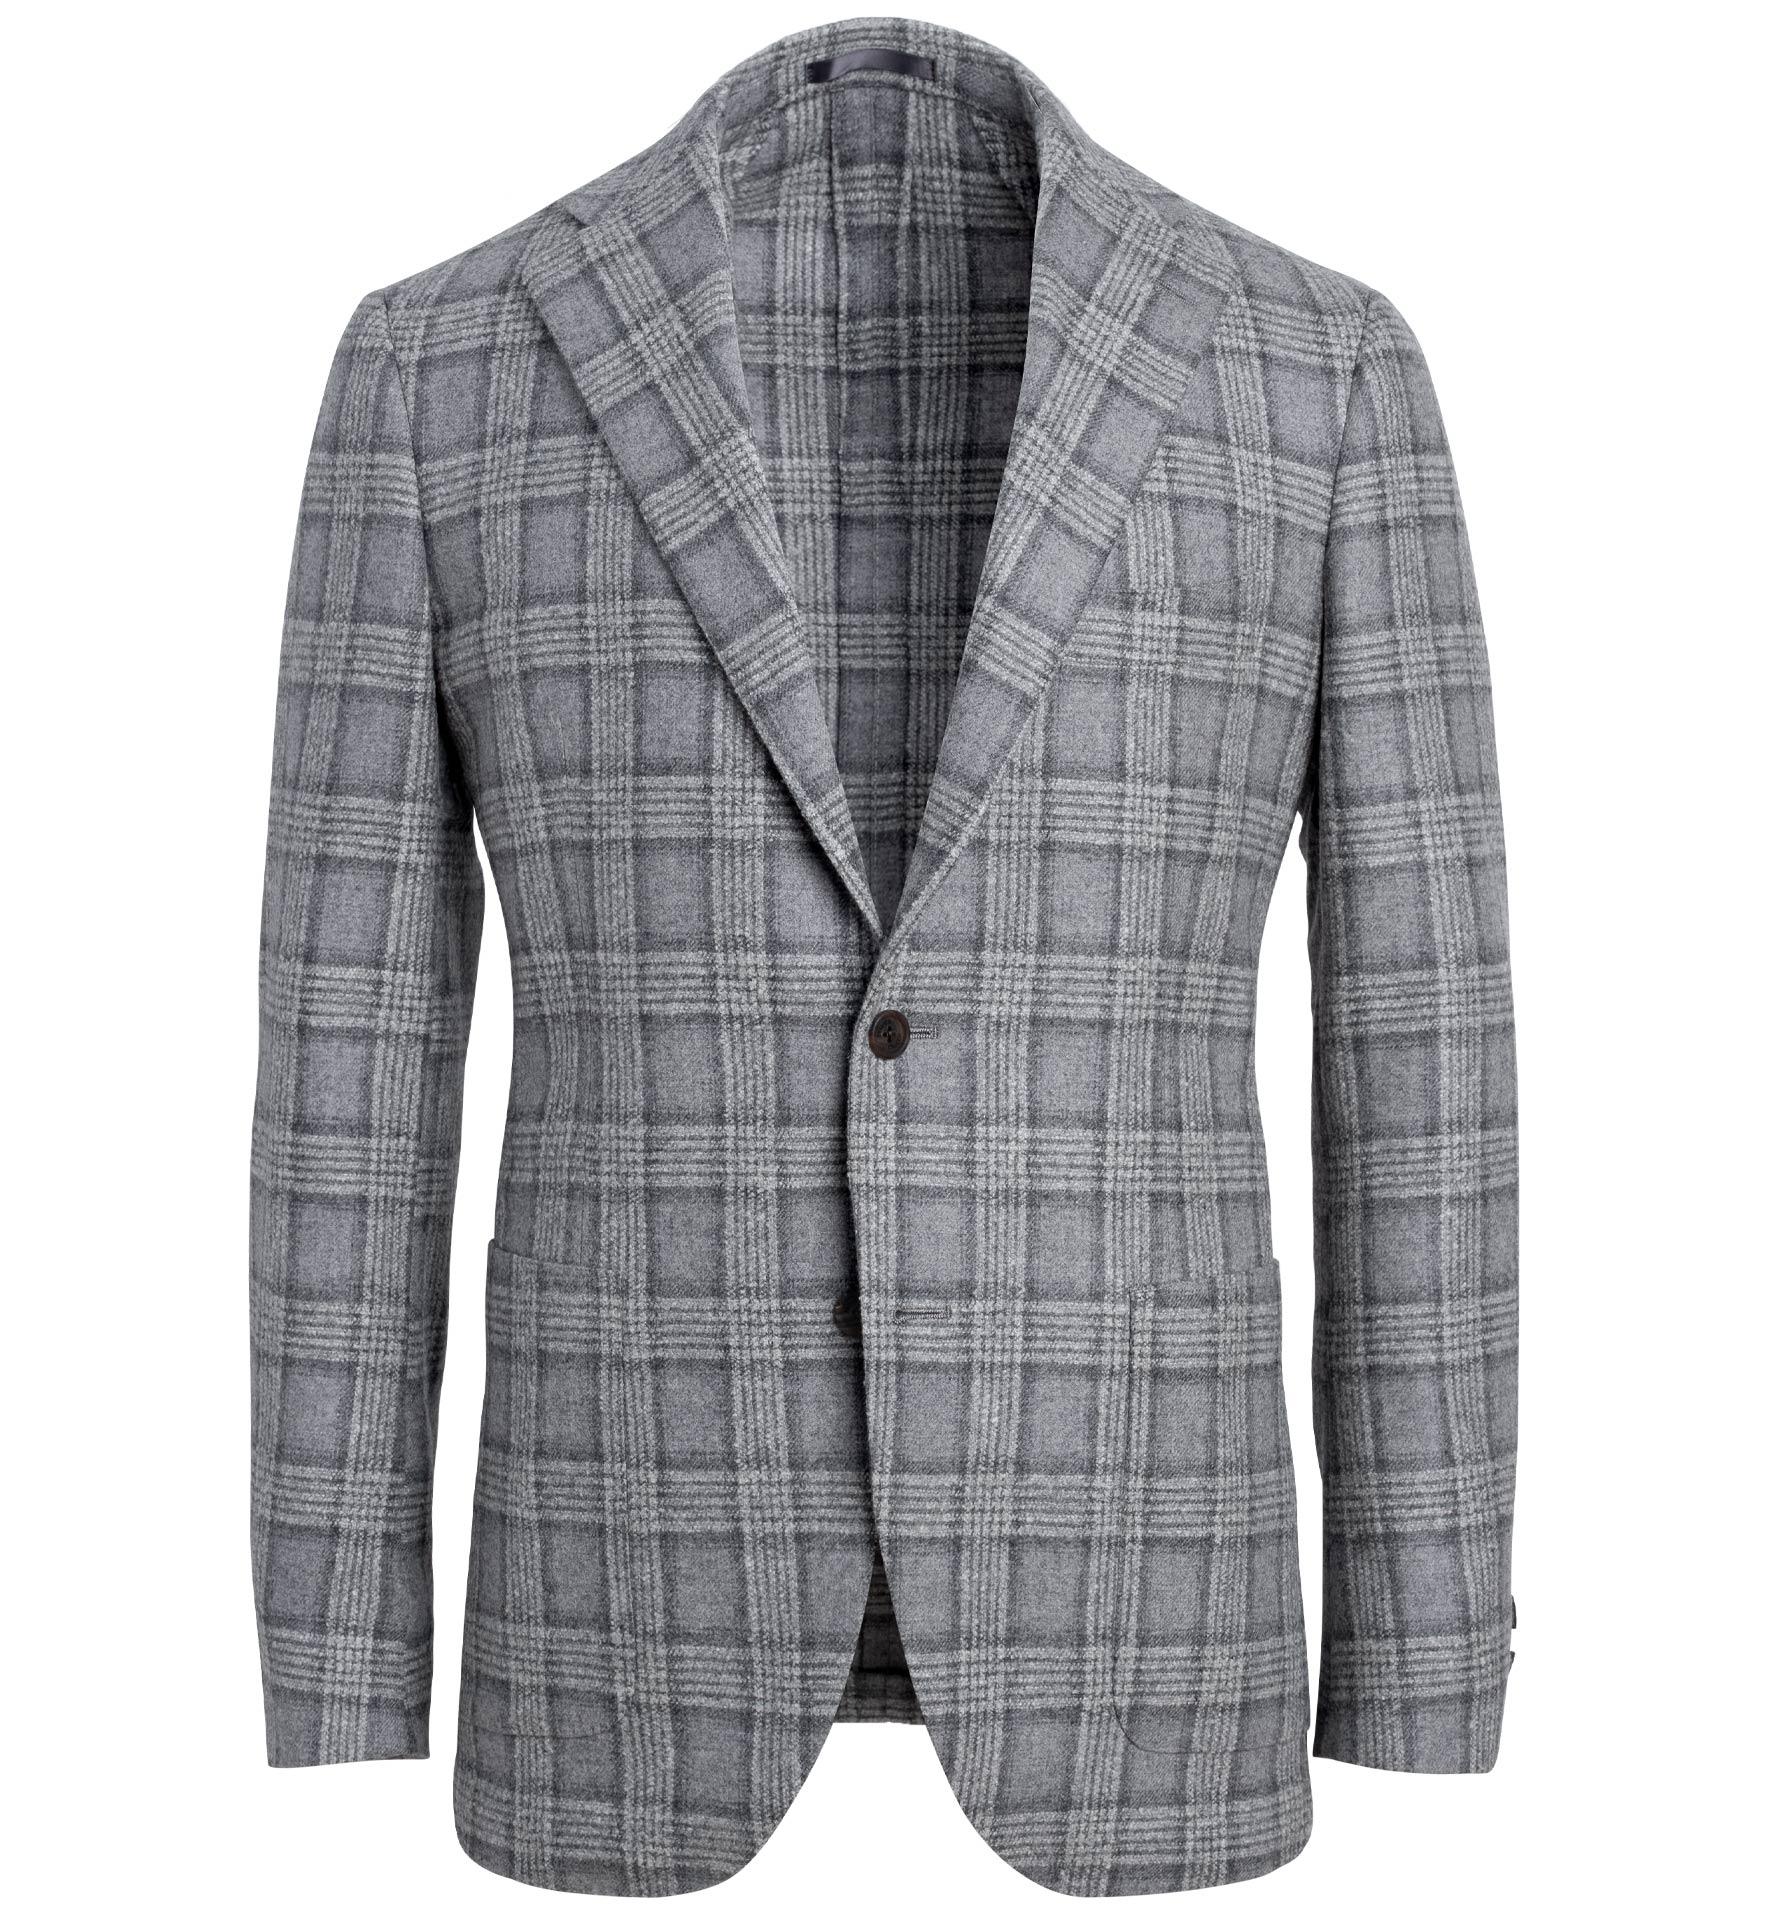 Zoom Image of Bedford Light Grey Plaid Wool Blend Jacket